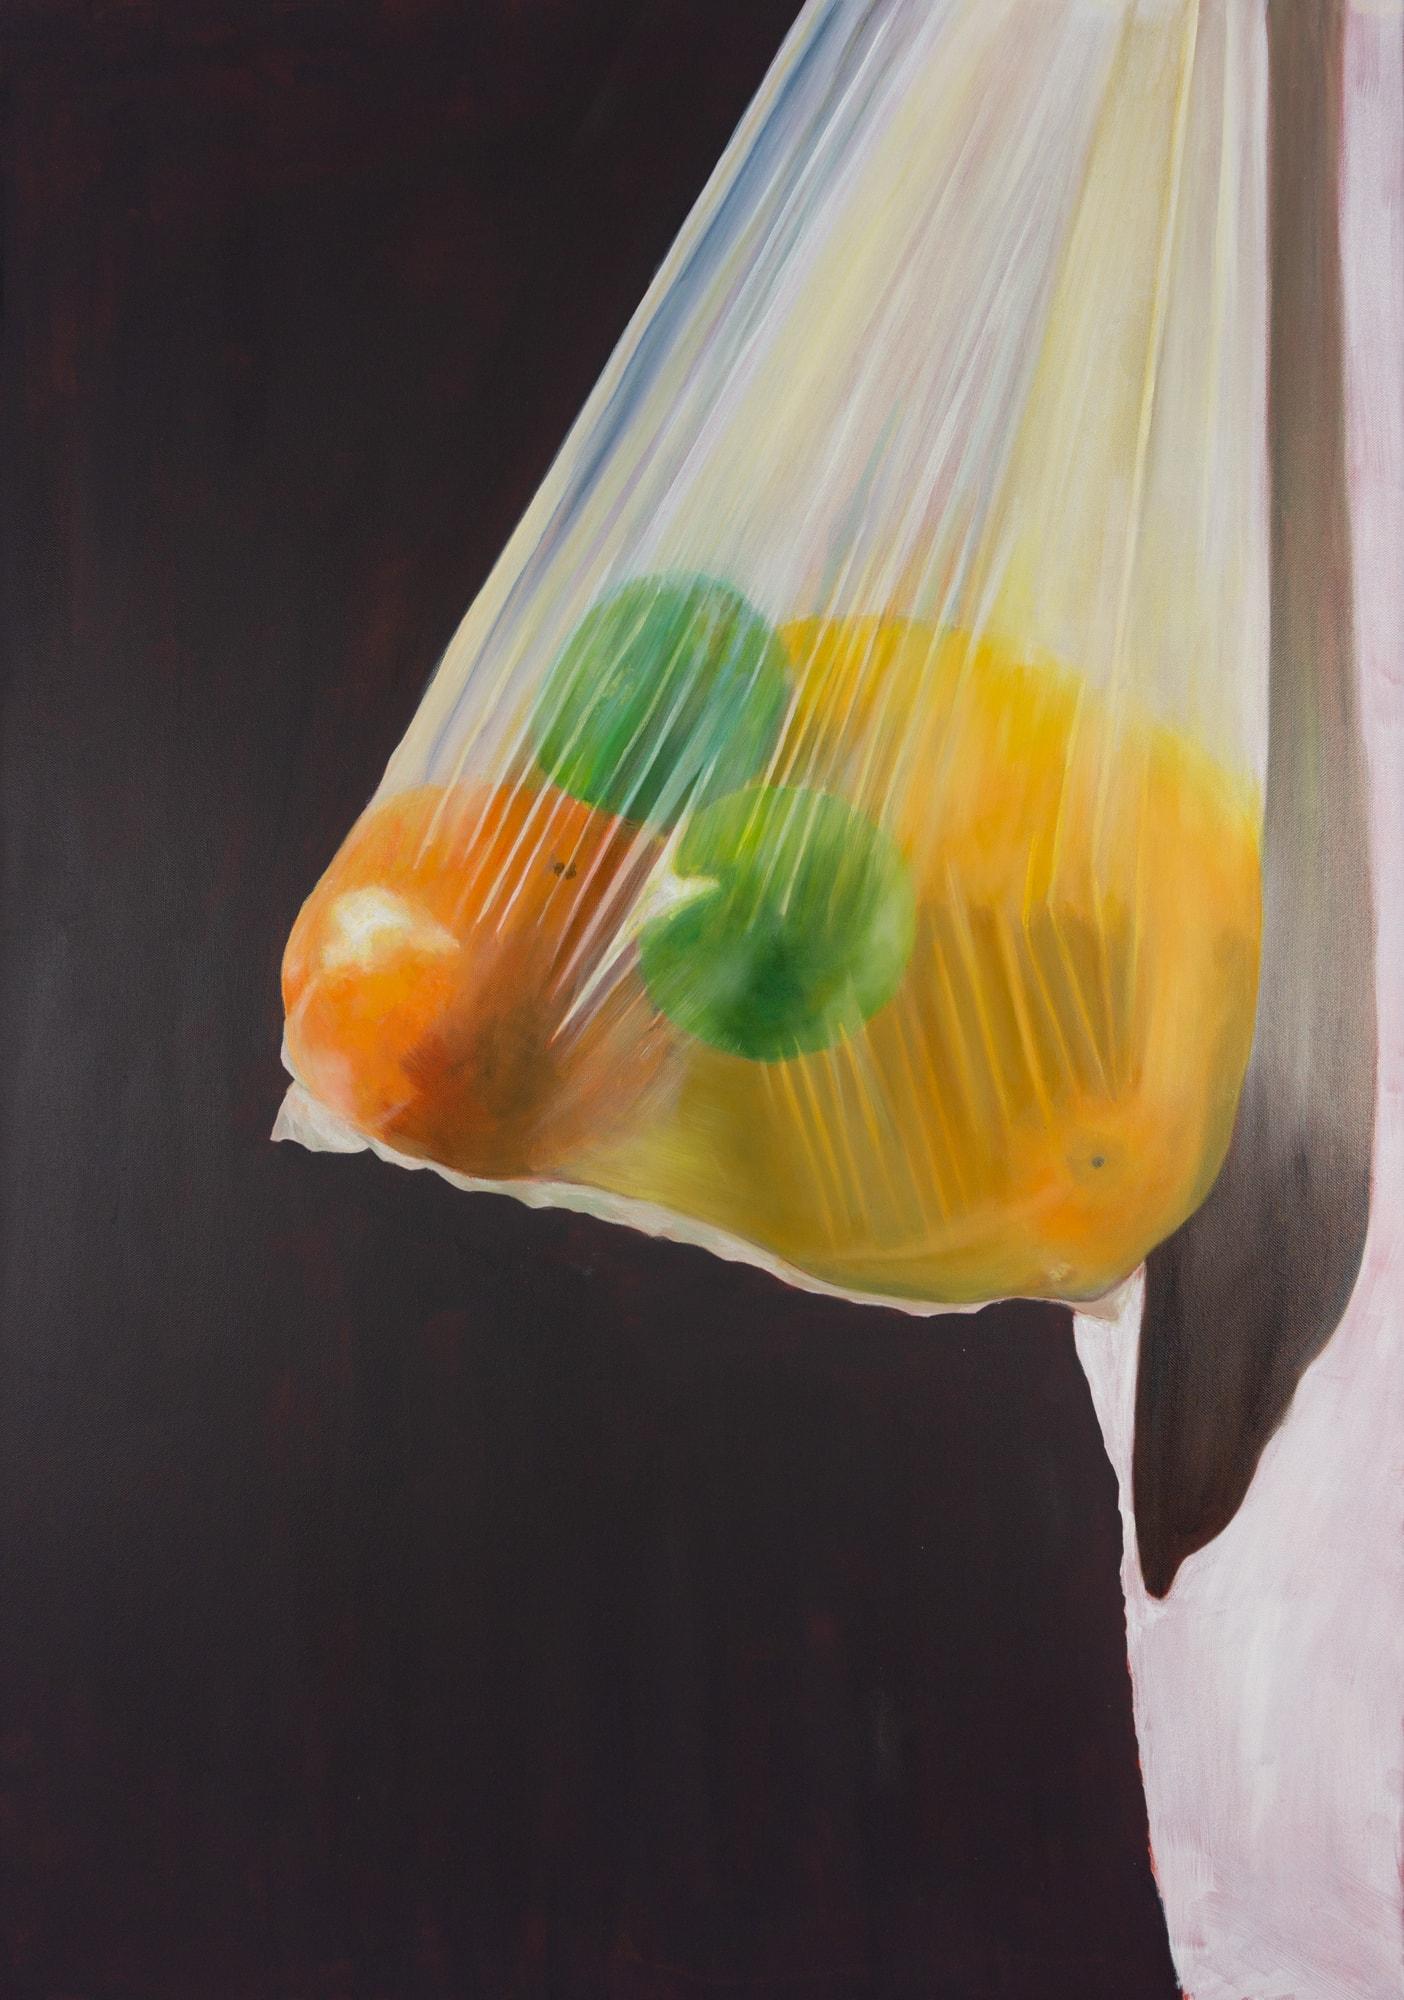 Malerei, Öl auf Leinwand, 70x100cm, Plastiksack mit Zitrusfrüchten, Künstlerin: Franziska King